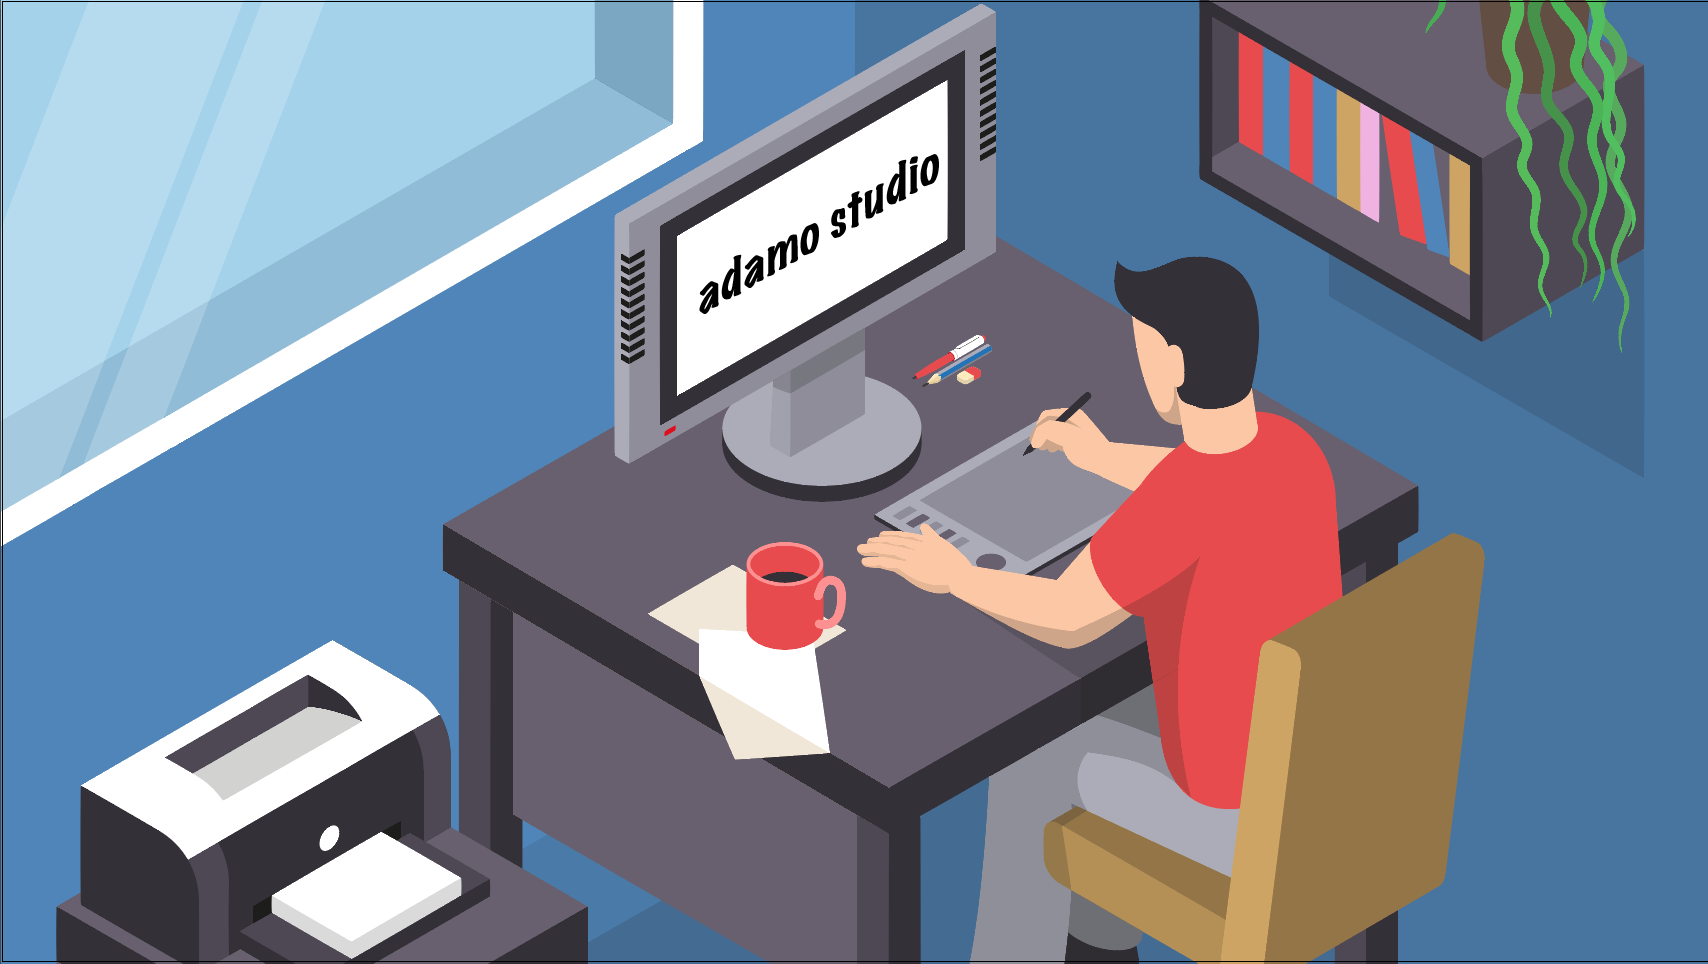 Adamo Studio tuyển Designer (8-12M) và Motion Graphic/Animator (10-15M)